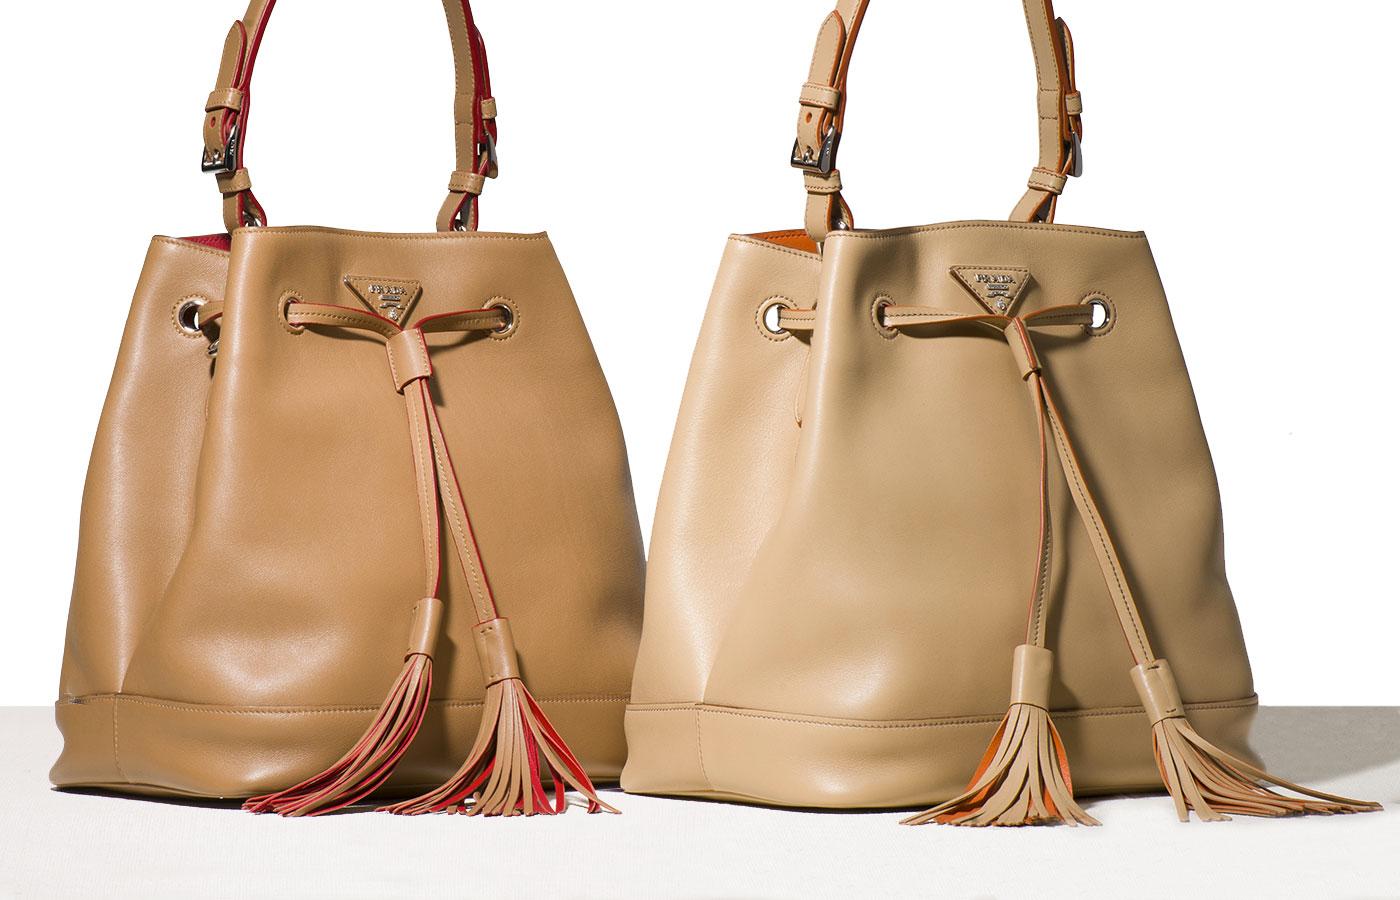 prada luggage bag - fringe prada bag